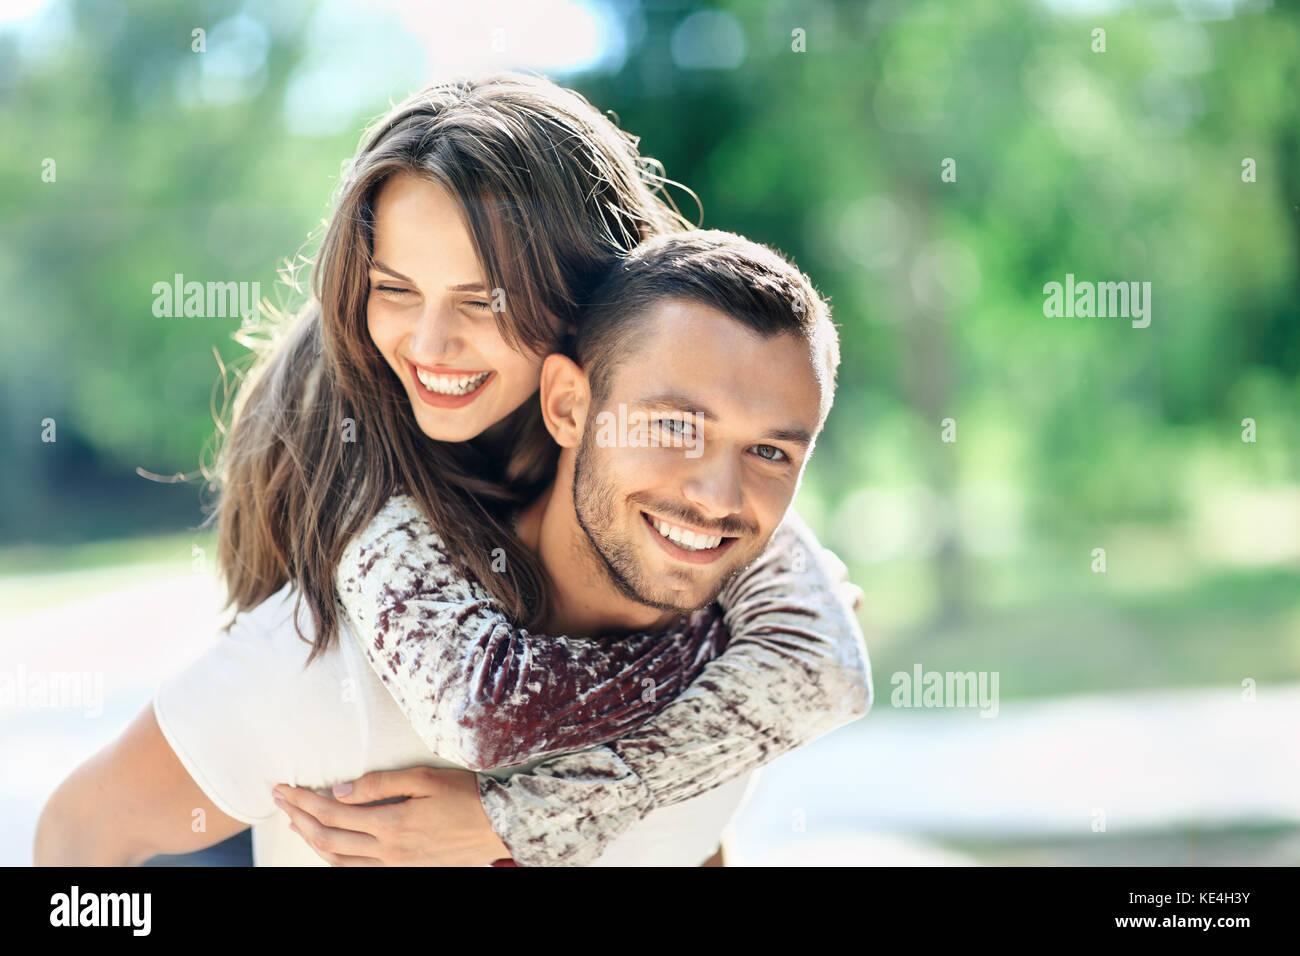 Les amateurs de plein air portrait of happy young man and woman looking at camera. Smiling girl profiter de son Banque D'Images